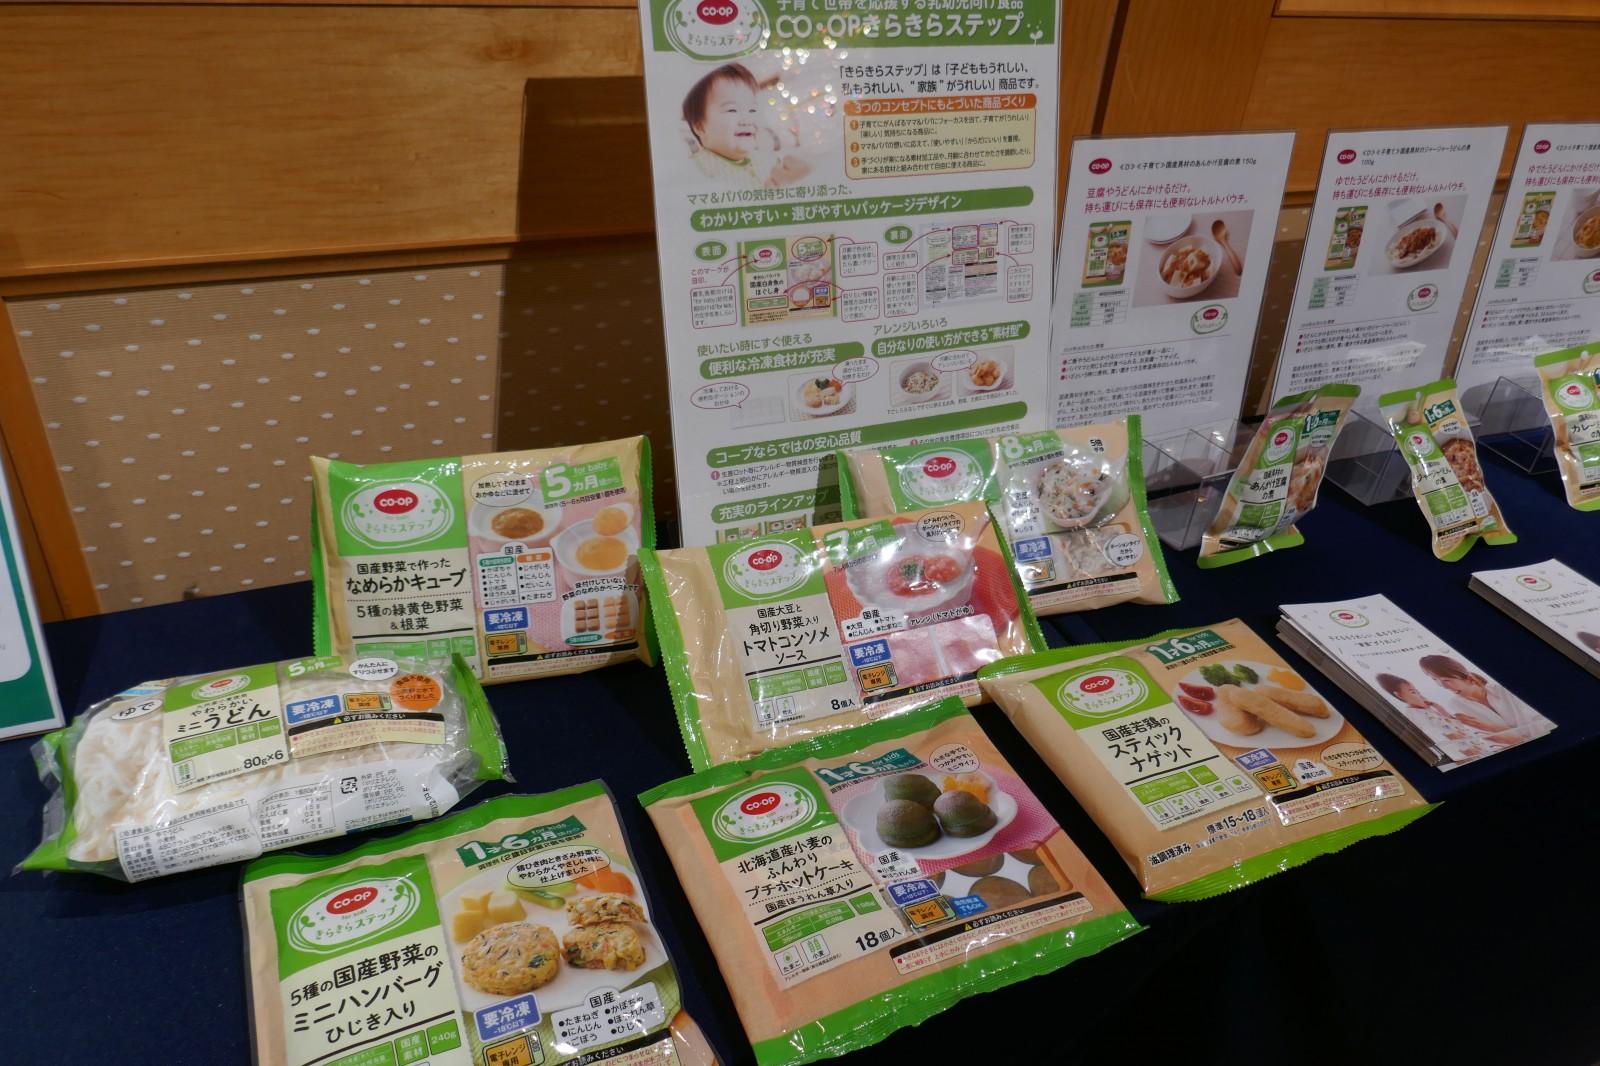 COOPの冷凍食品離乳食が発売2年、若い世代の生協加入が増えました